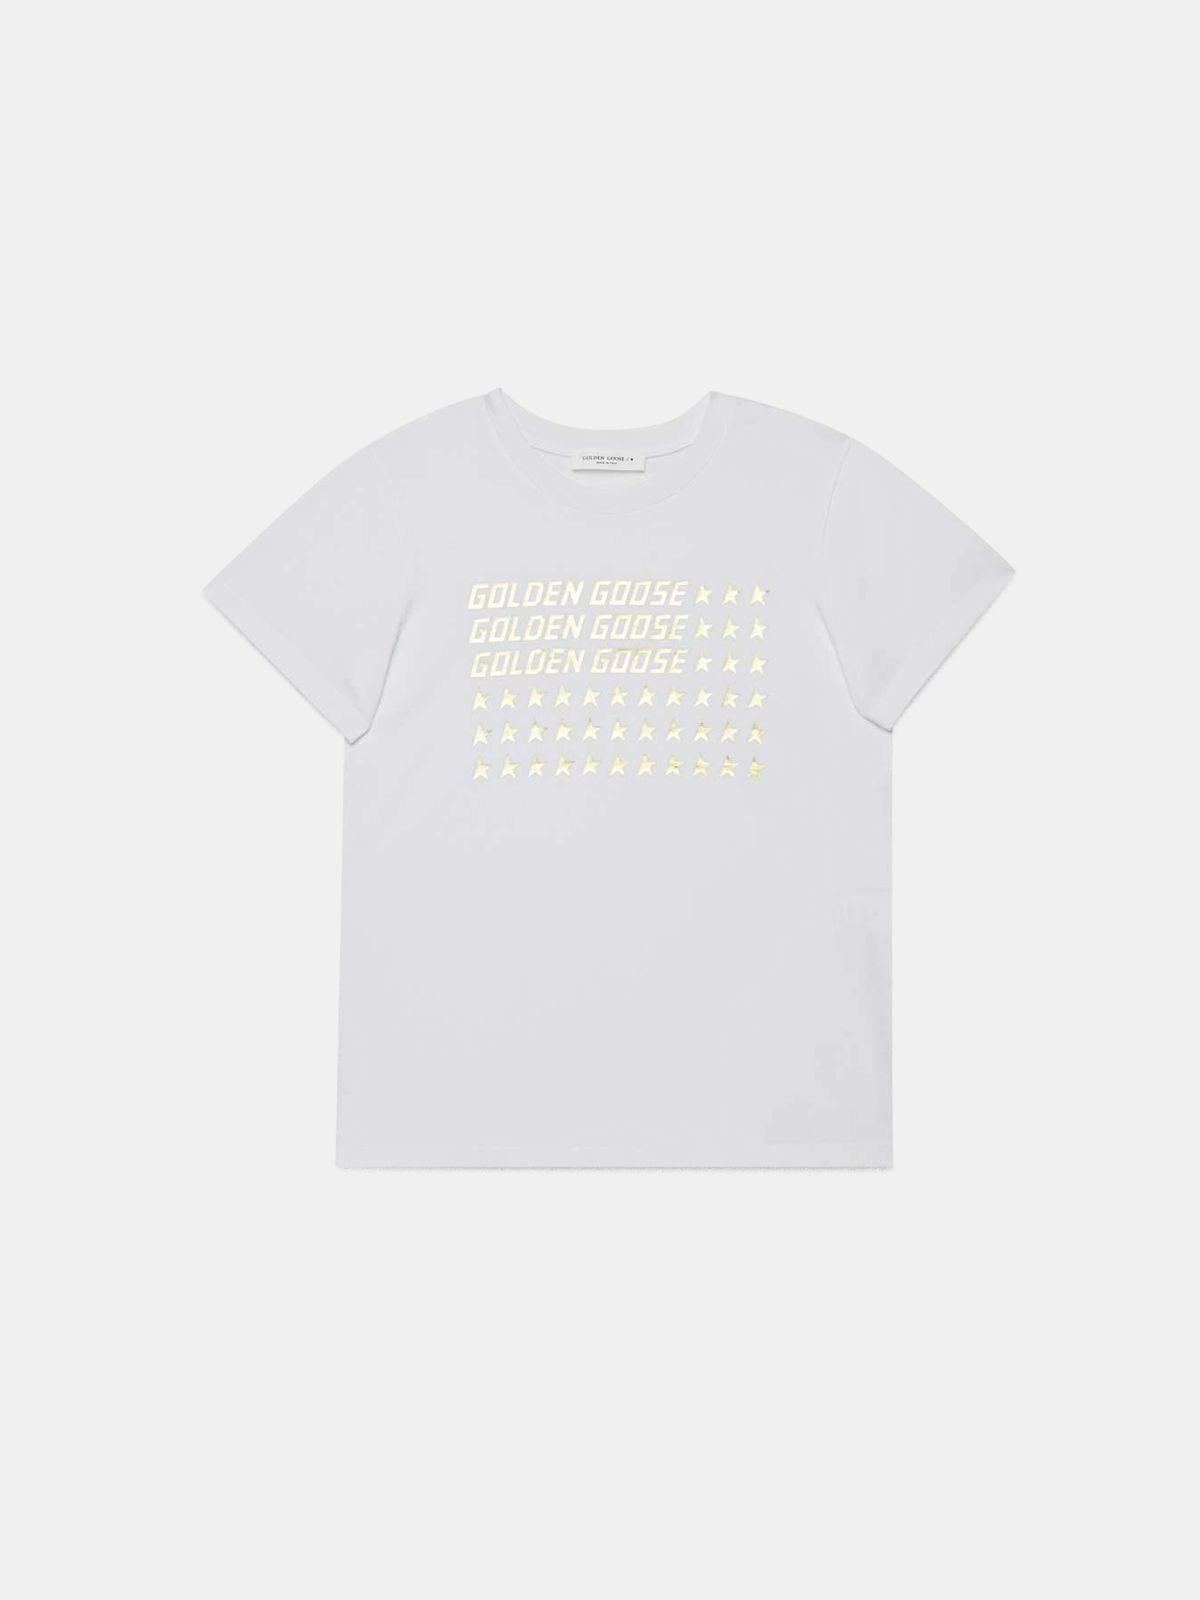 T-shirt Venice bianca con stampa dorata flag